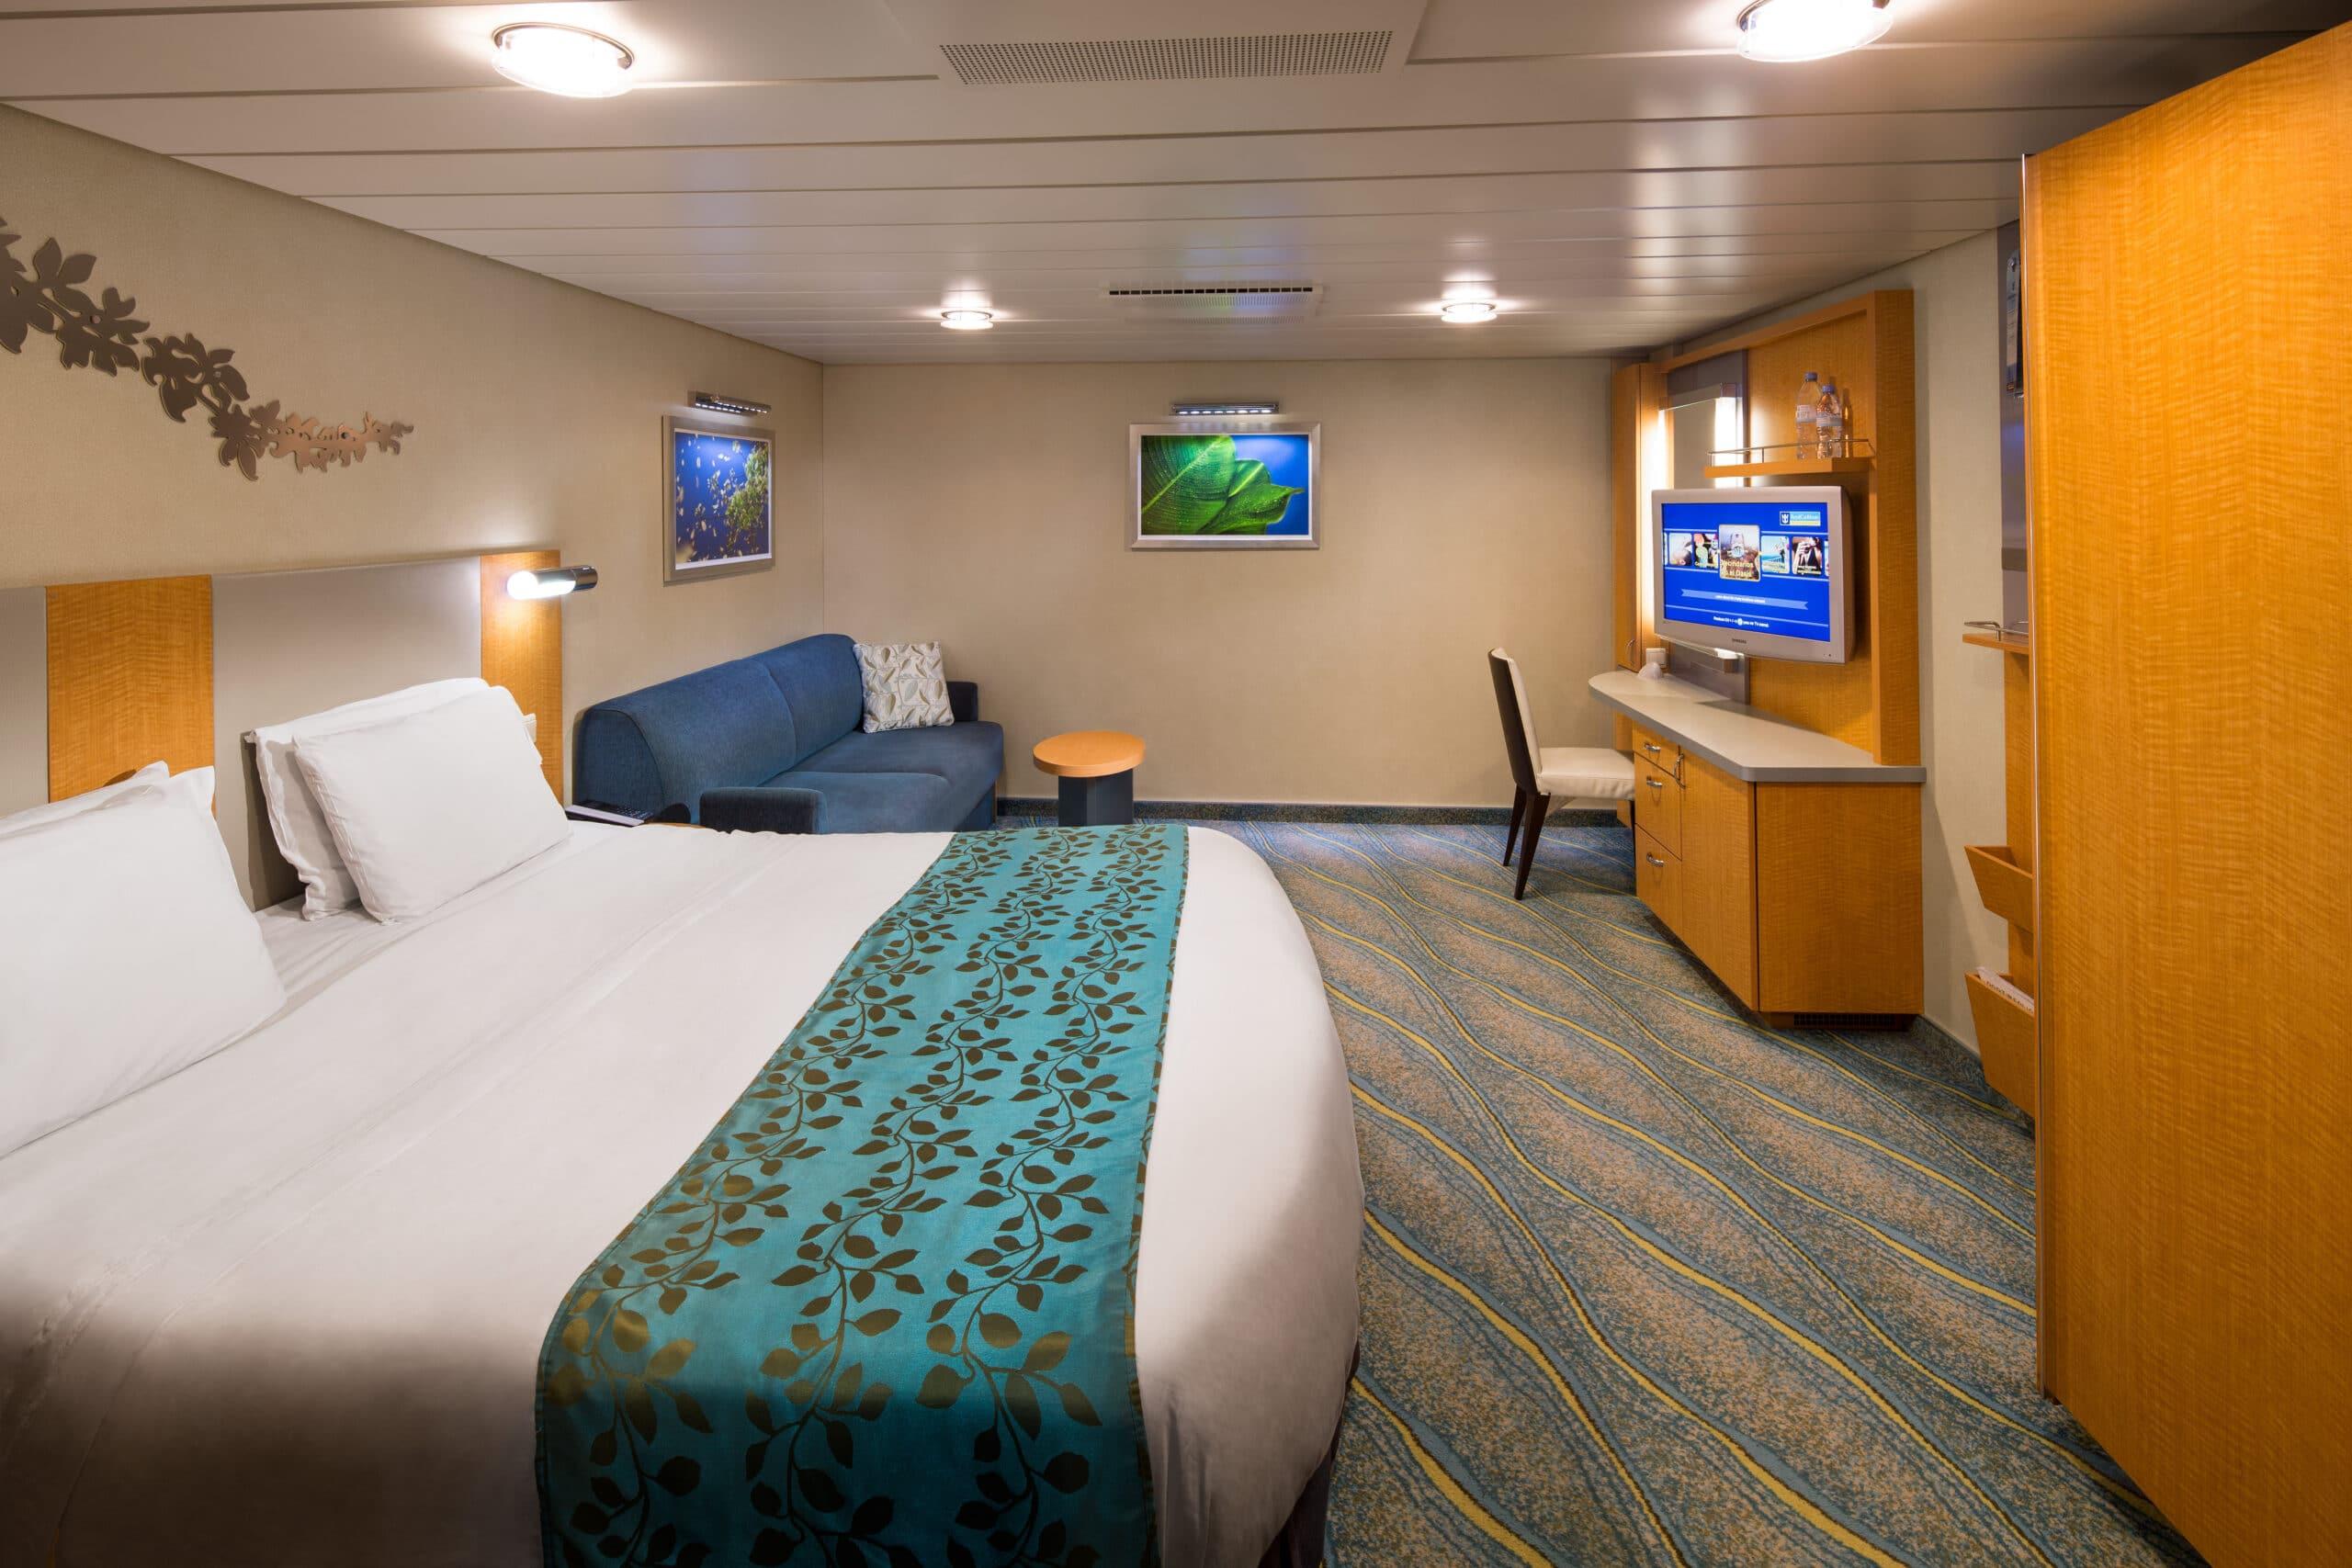 Royal-Caribbean-International-Allure-of-the-Seas-Oasis-of-the-seas-schip-cruiseschip-categorie-1R-Ruime-binnenhut